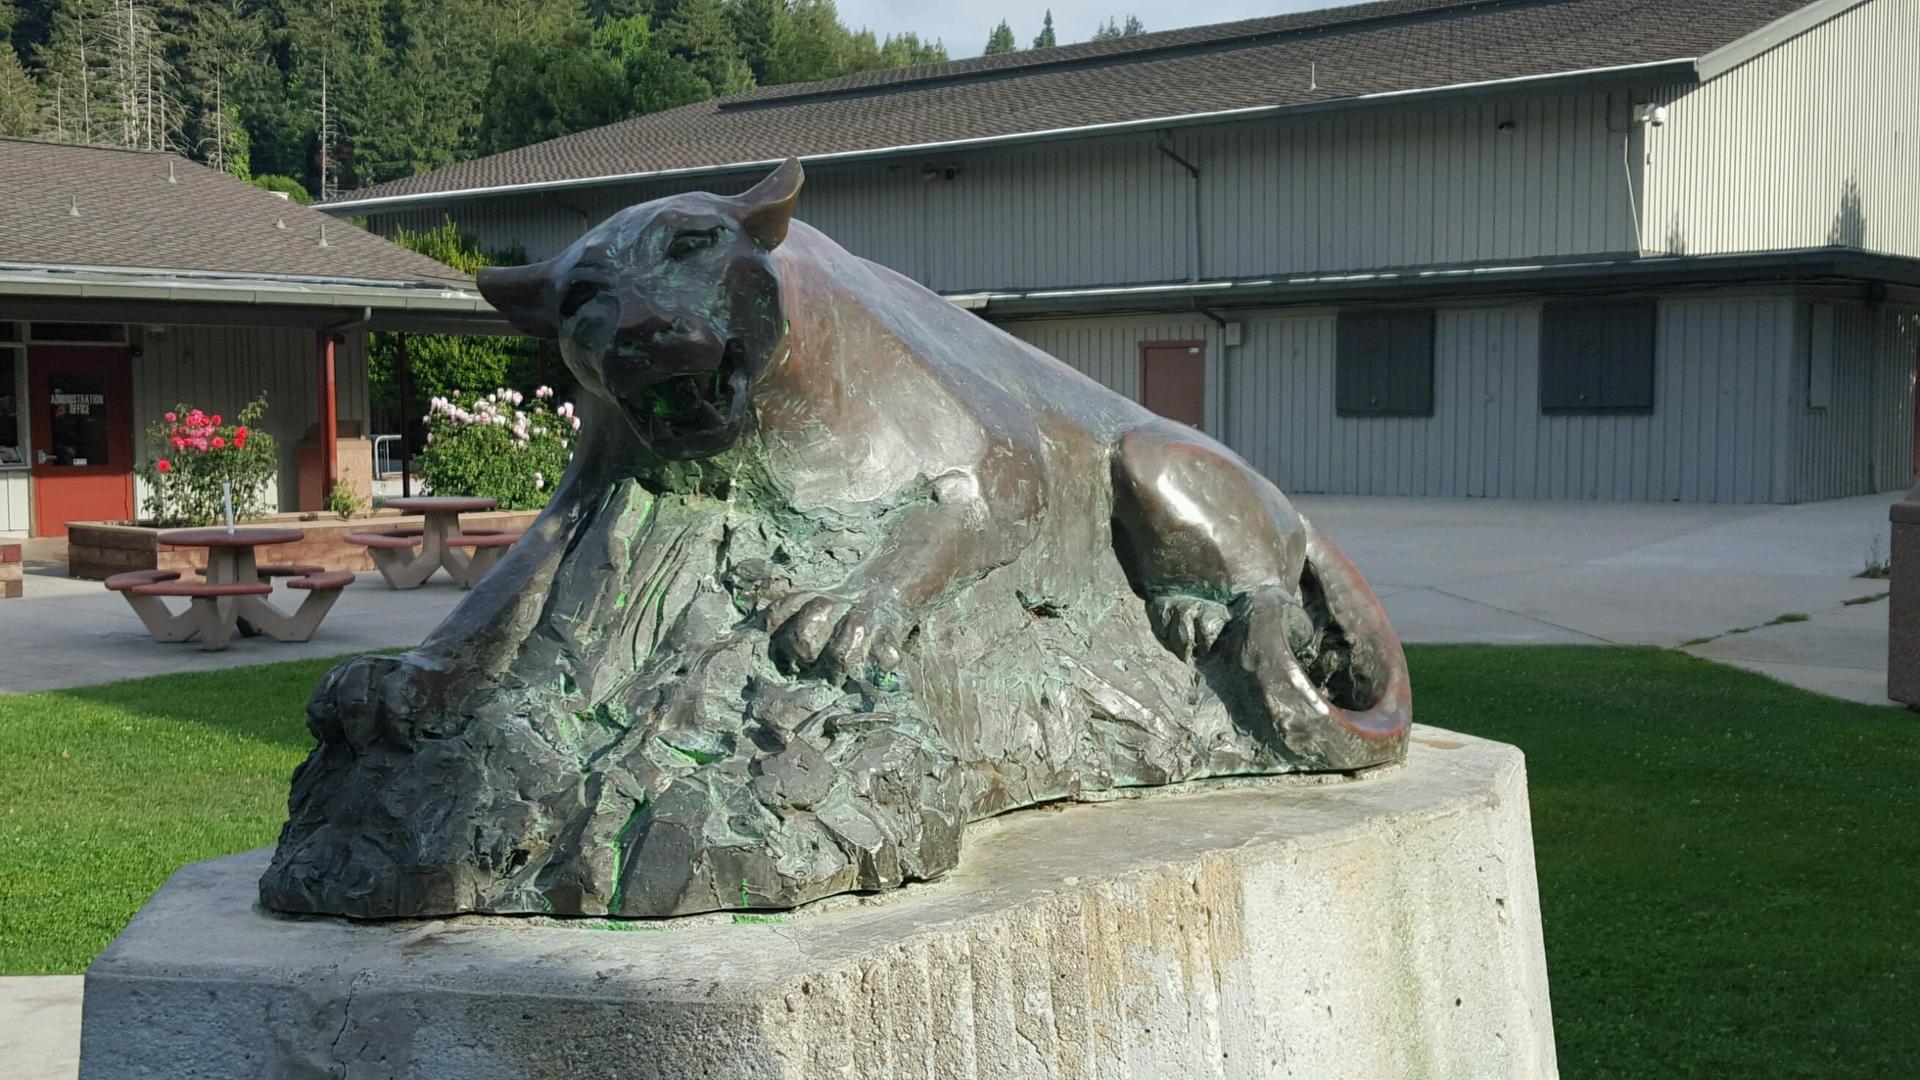 Cougar Pic at High School